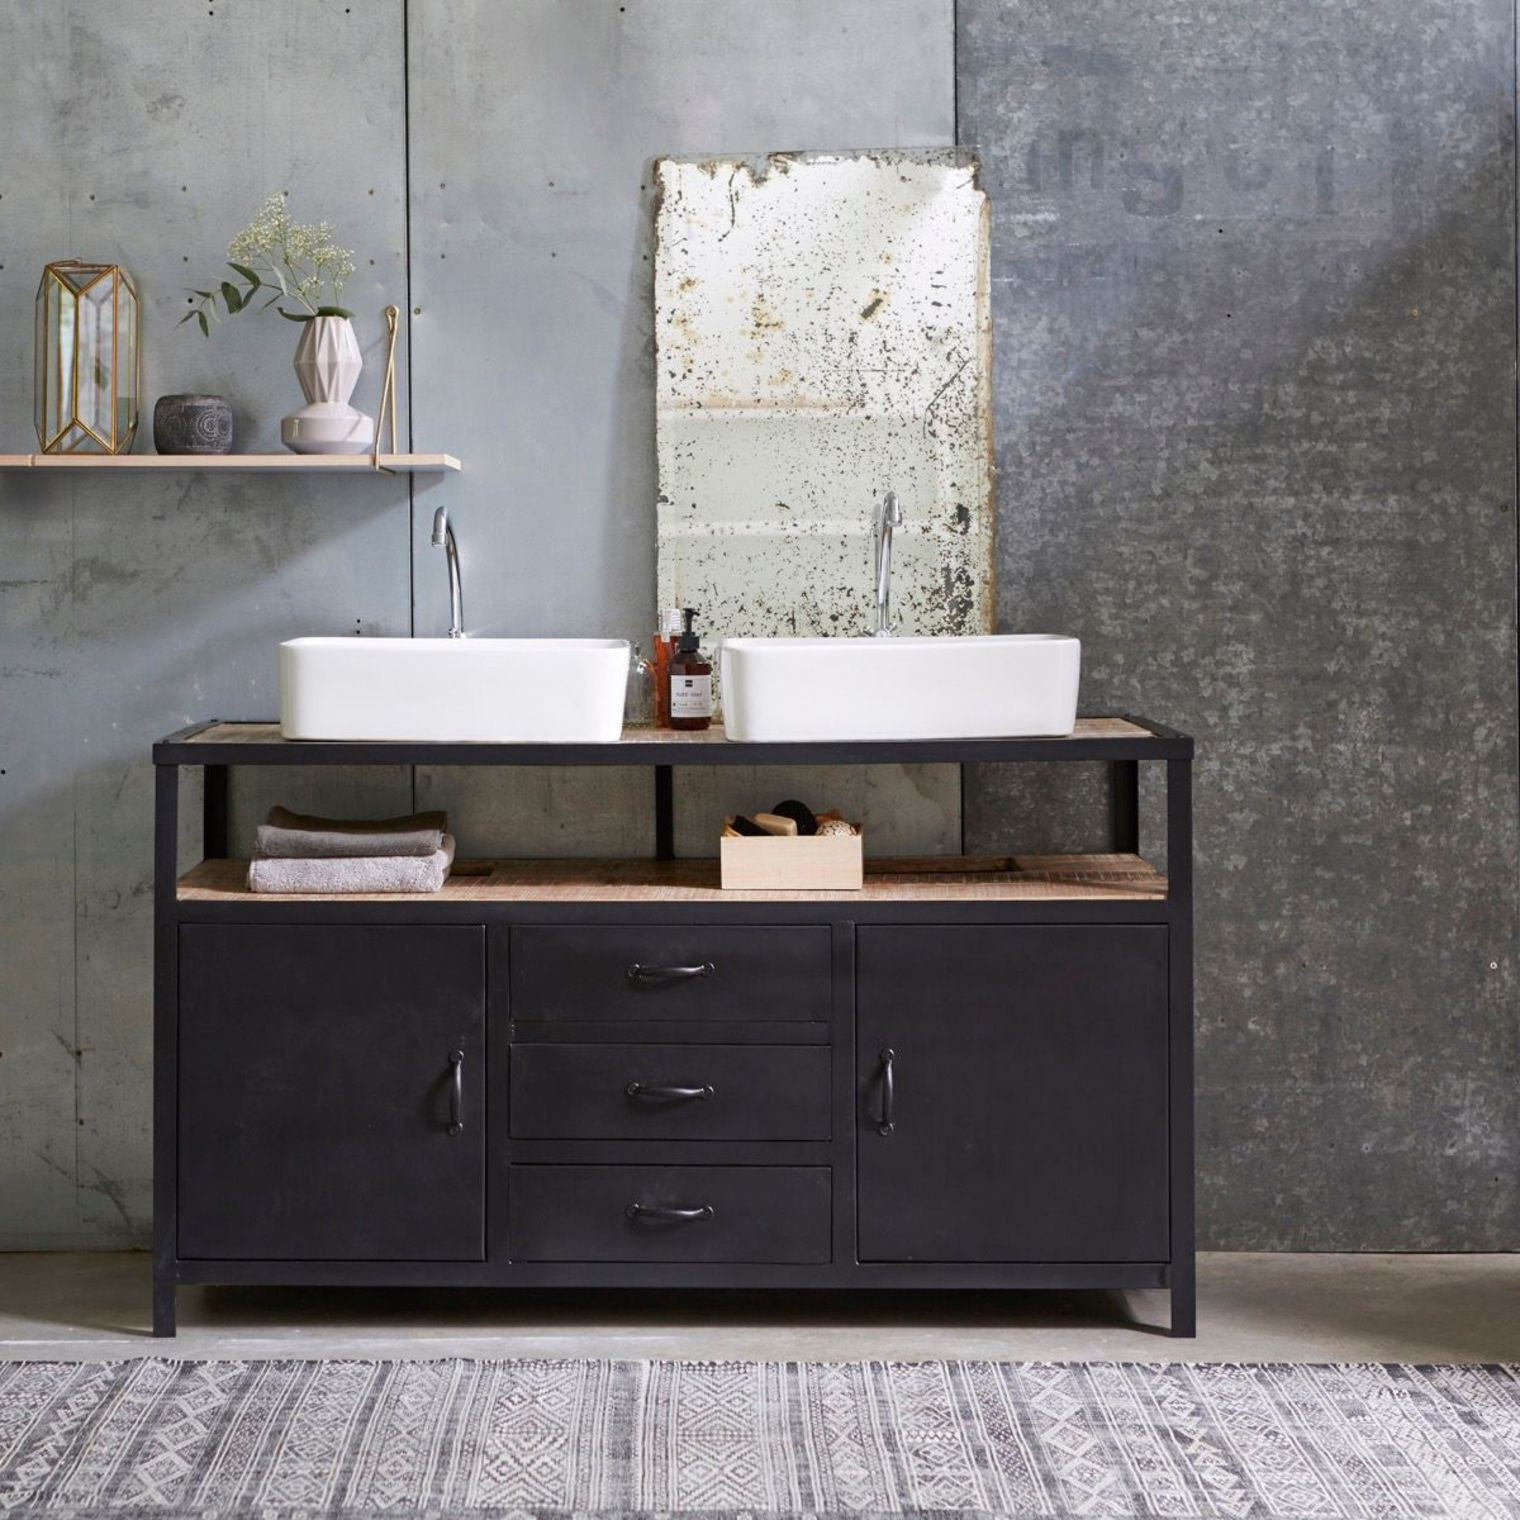 Meuble salle bain bois, design, Ikea, Lapeyre  Meuble sous